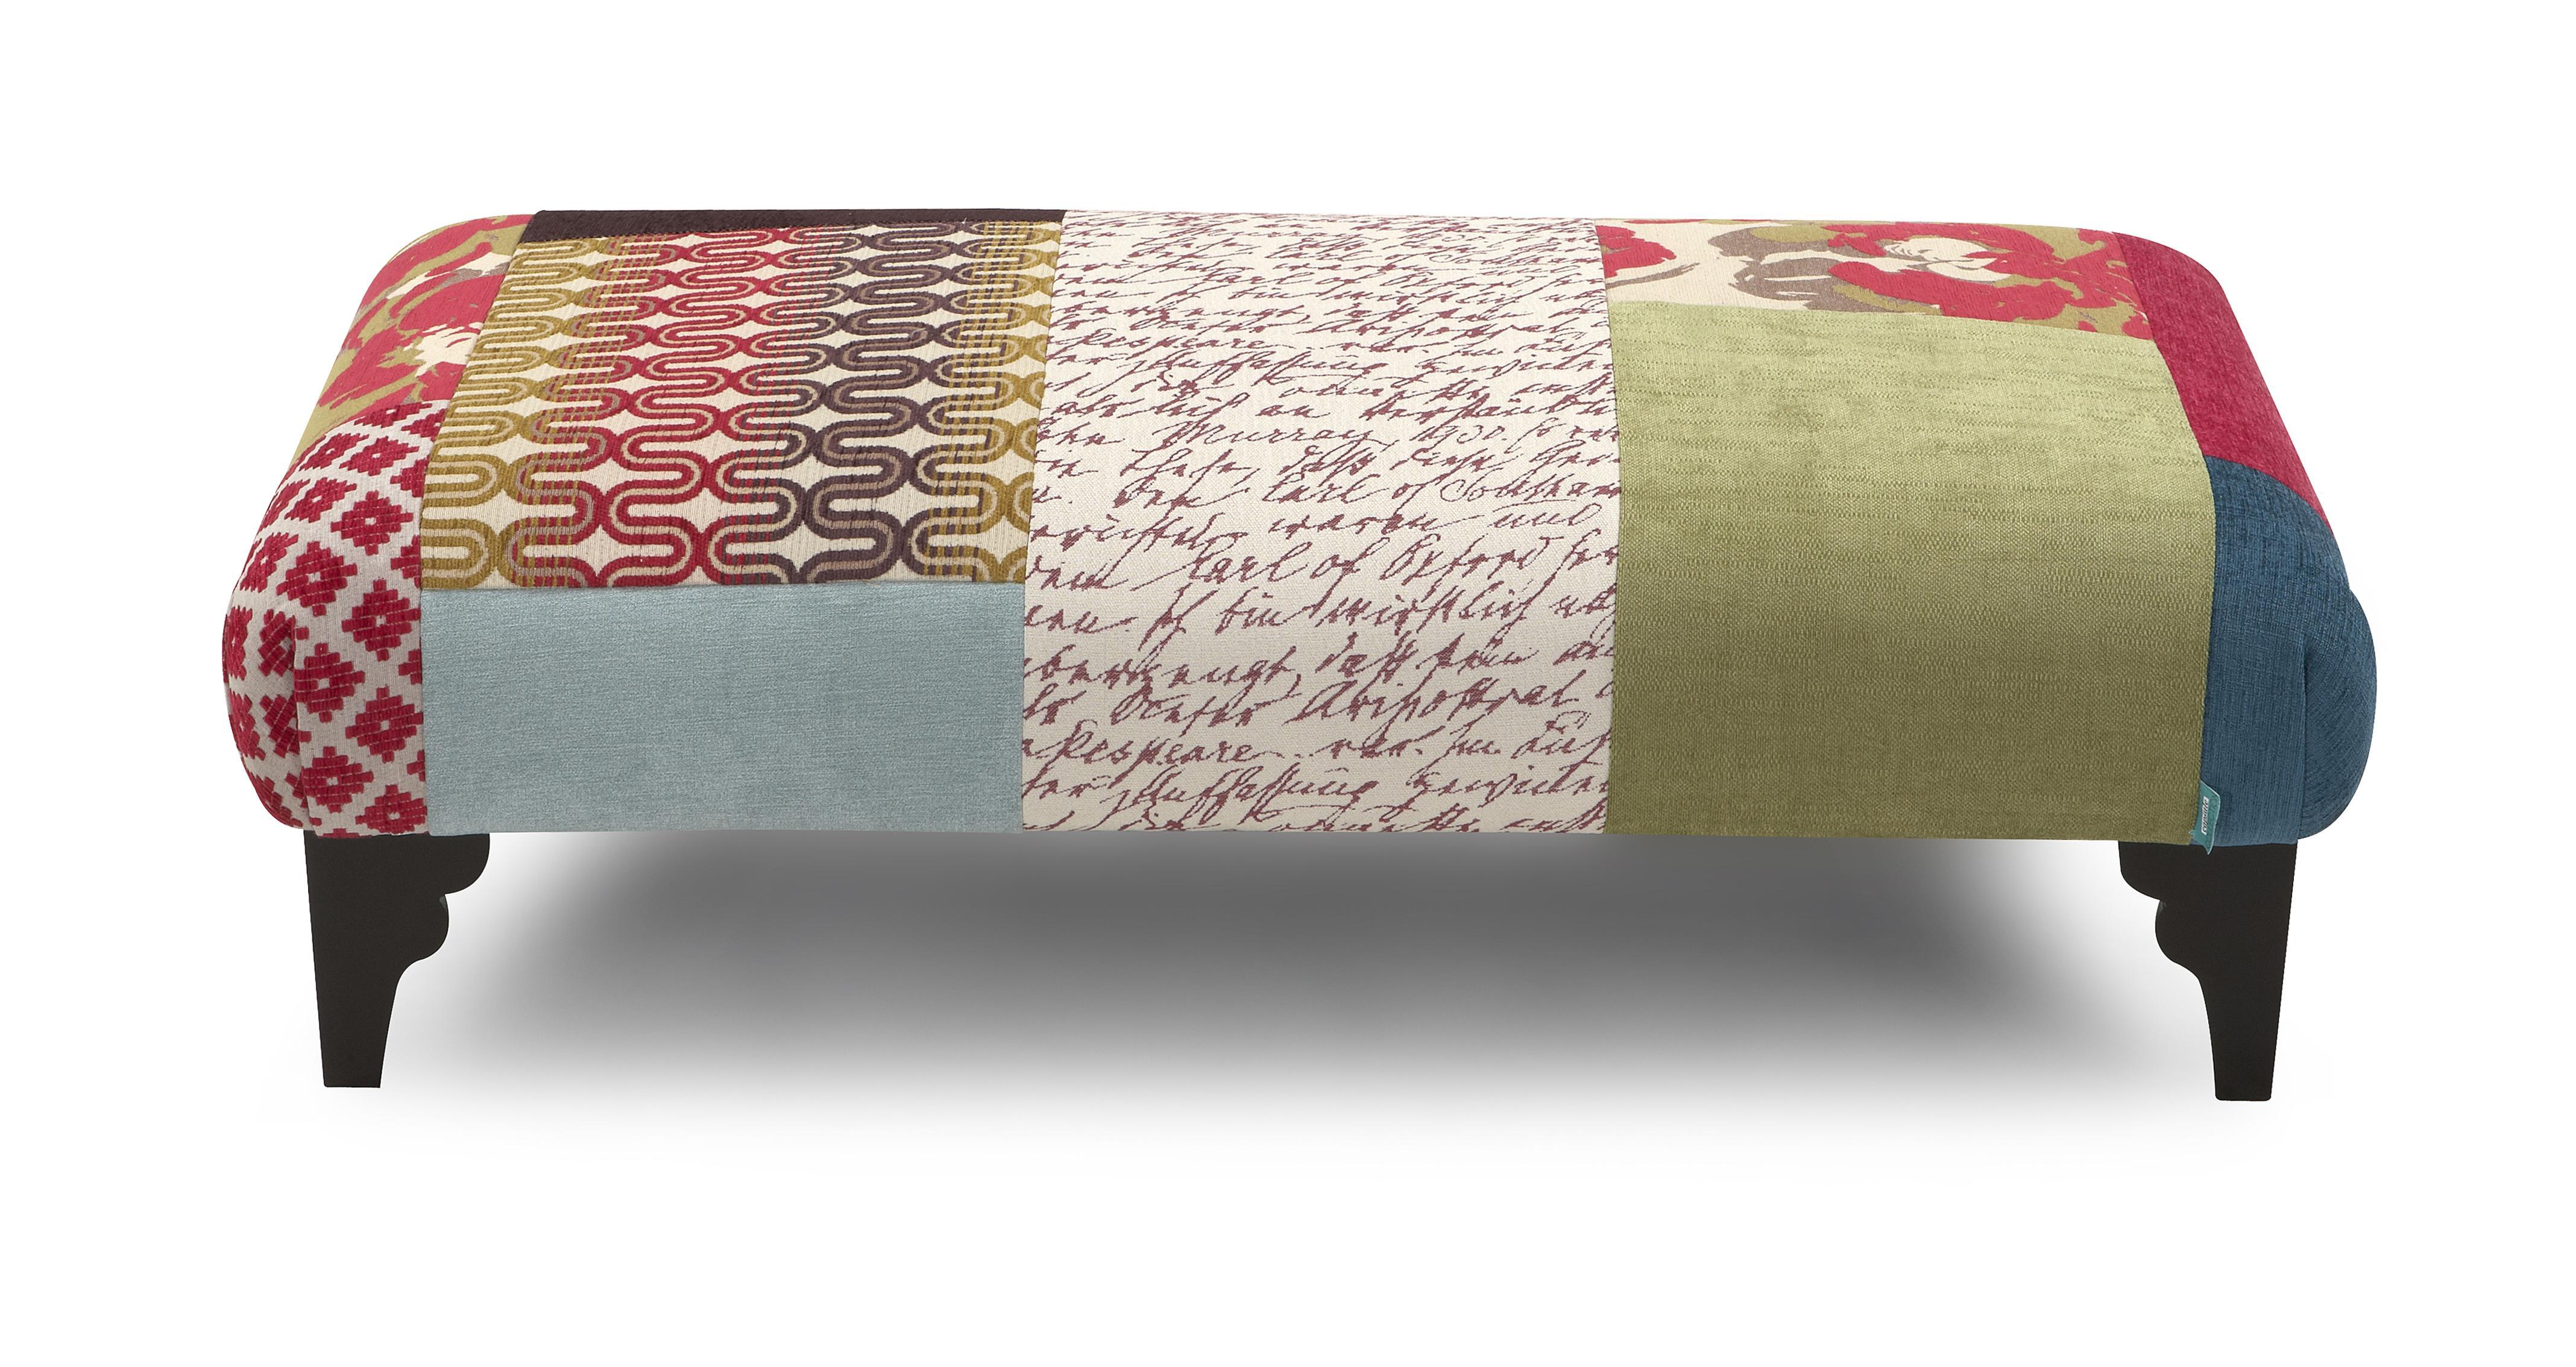 Shout footstool shout patchwork dfs for Chaise longue ireland